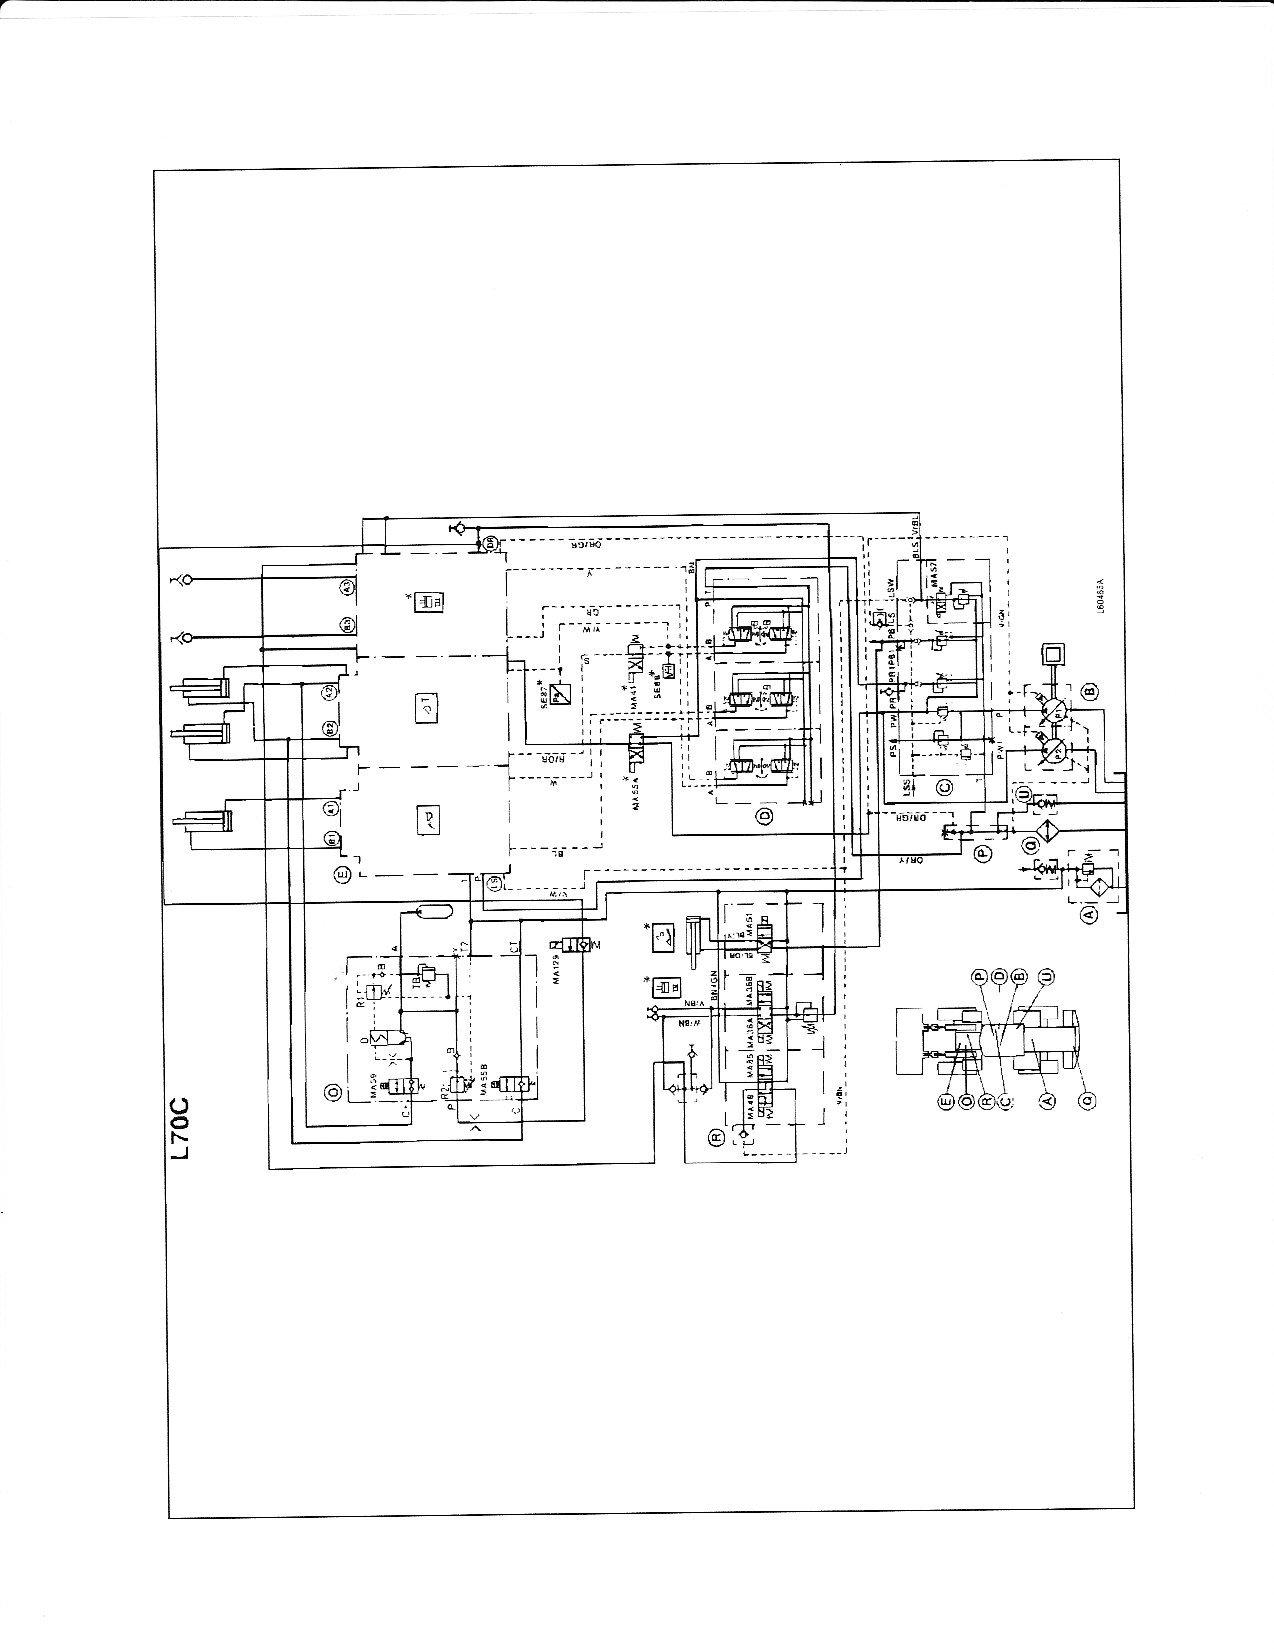 volvo l70c wiring diagram basic wiring diagram u2022 rh rnetcomputer co